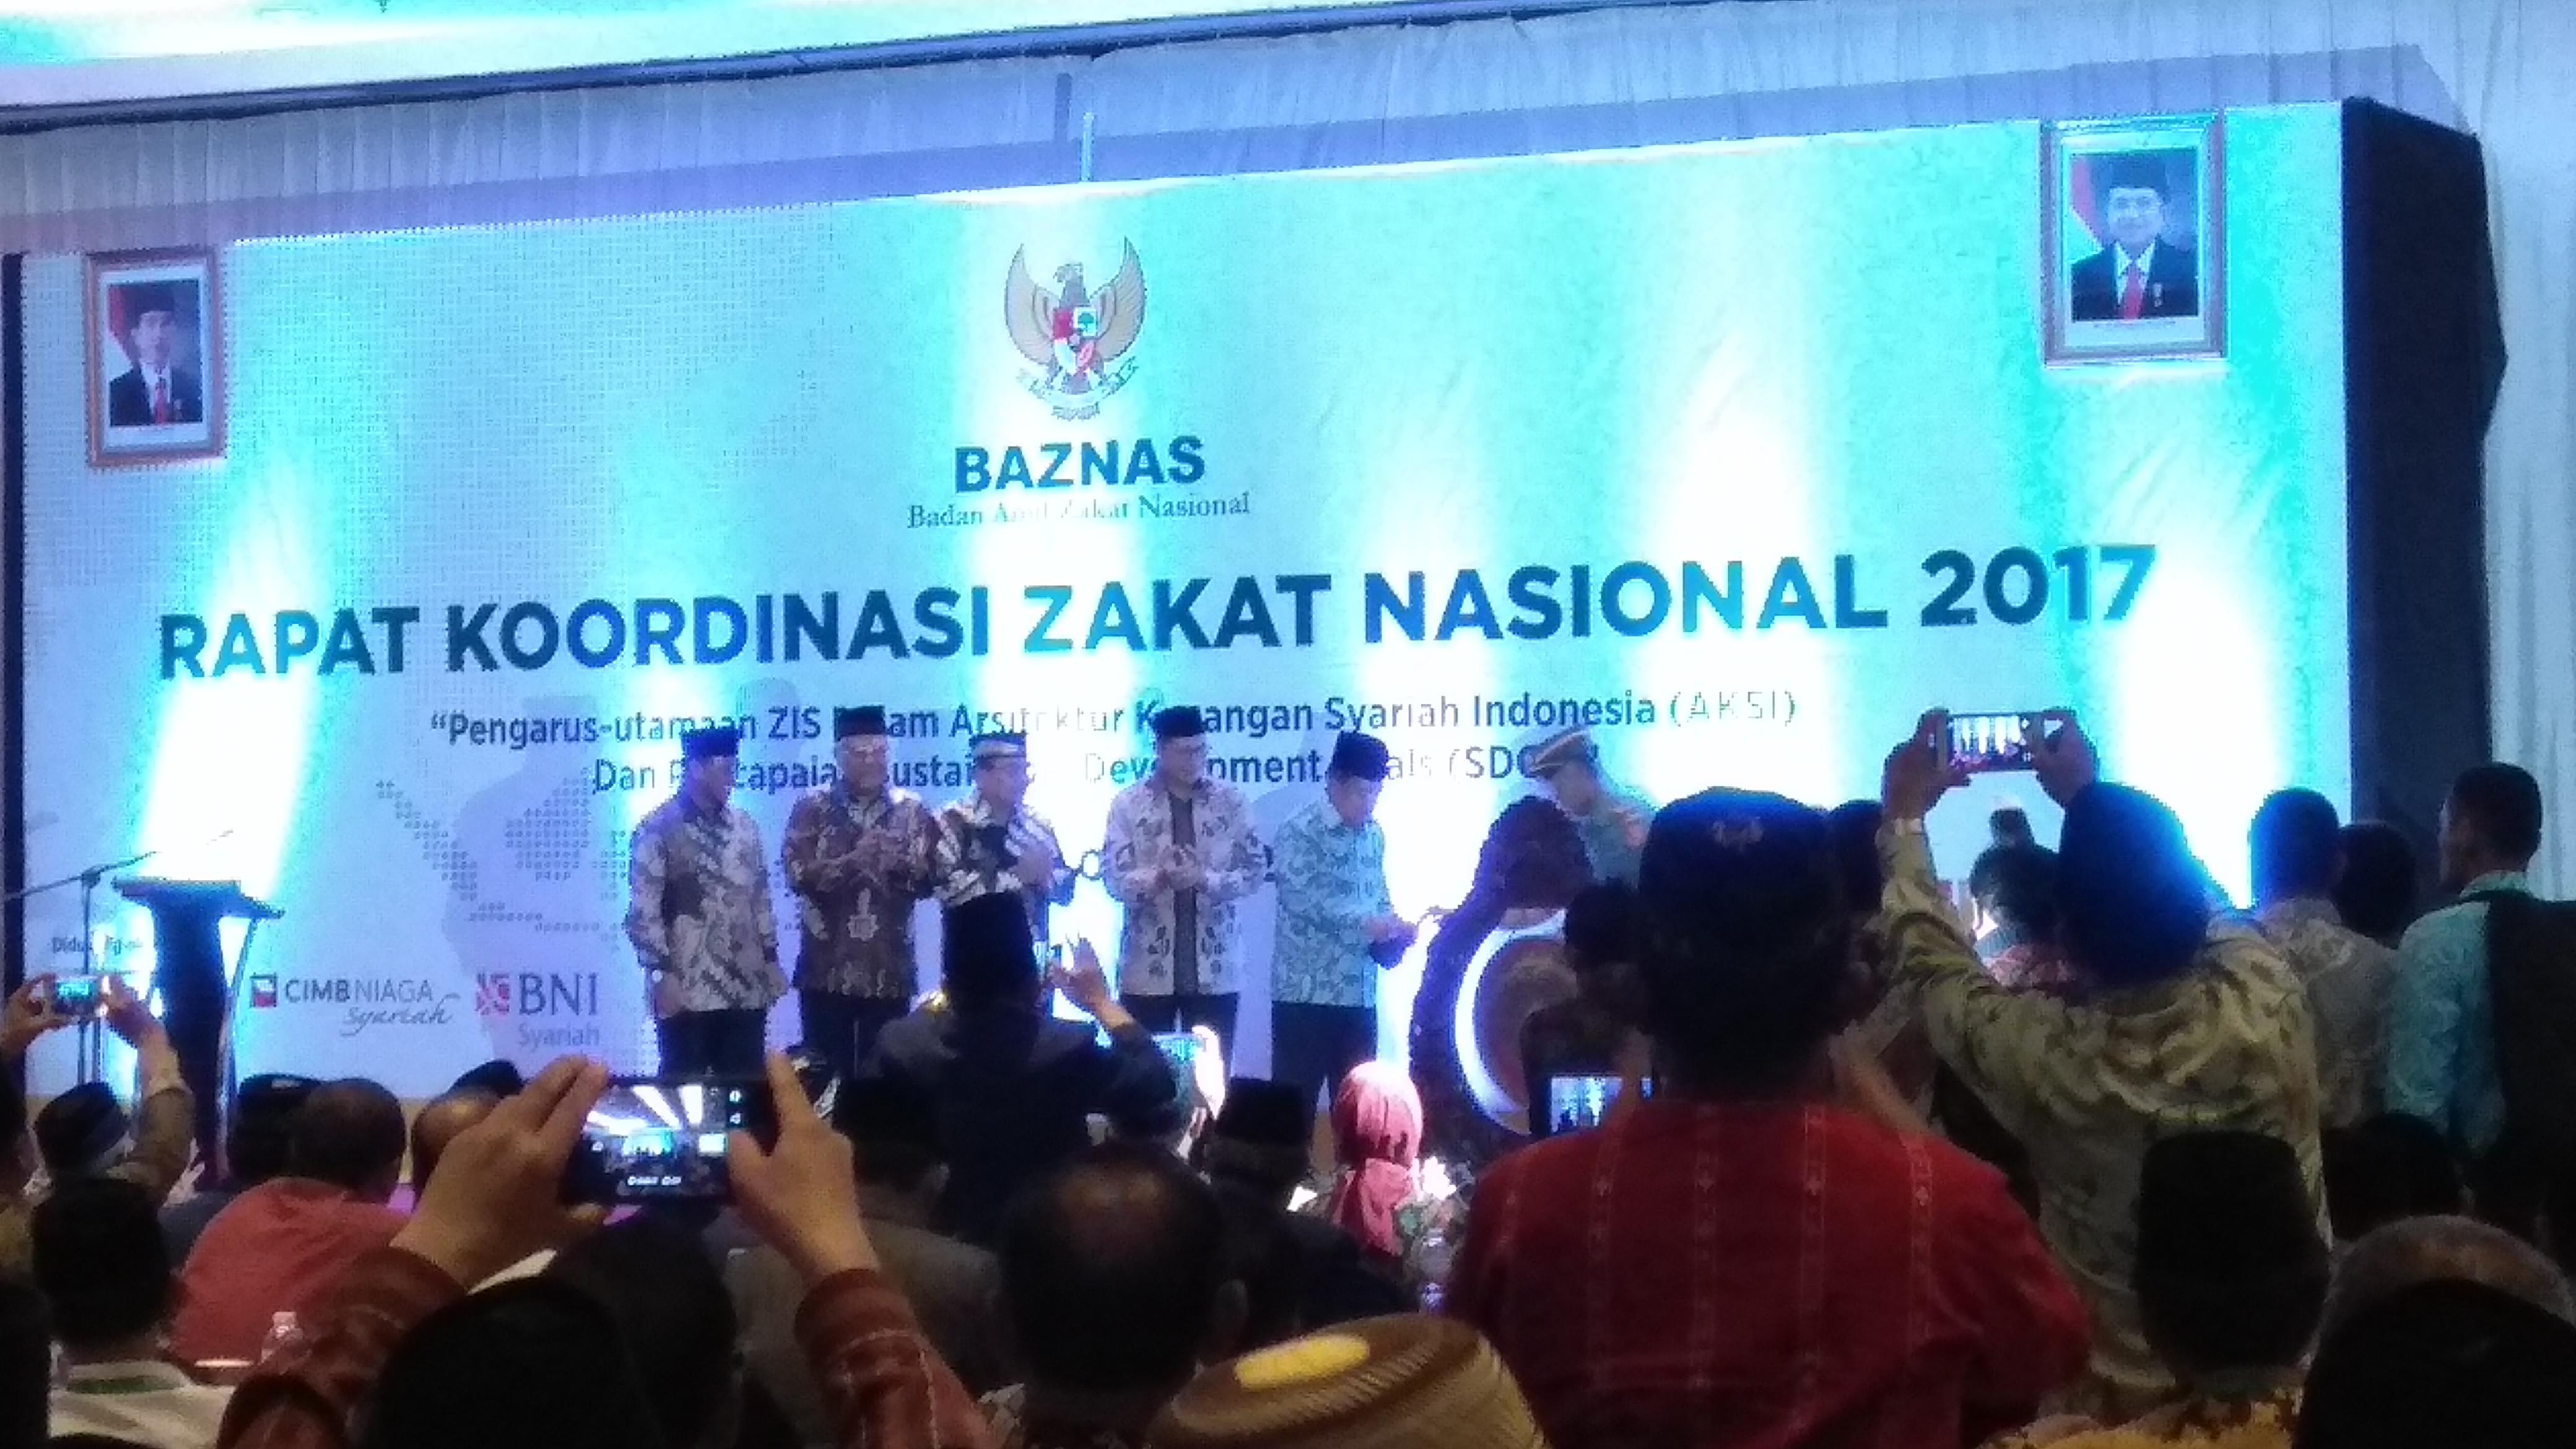 Wapres Jusuf Kalla Buka Rapat Koordinasi Zakat Nasional 2017